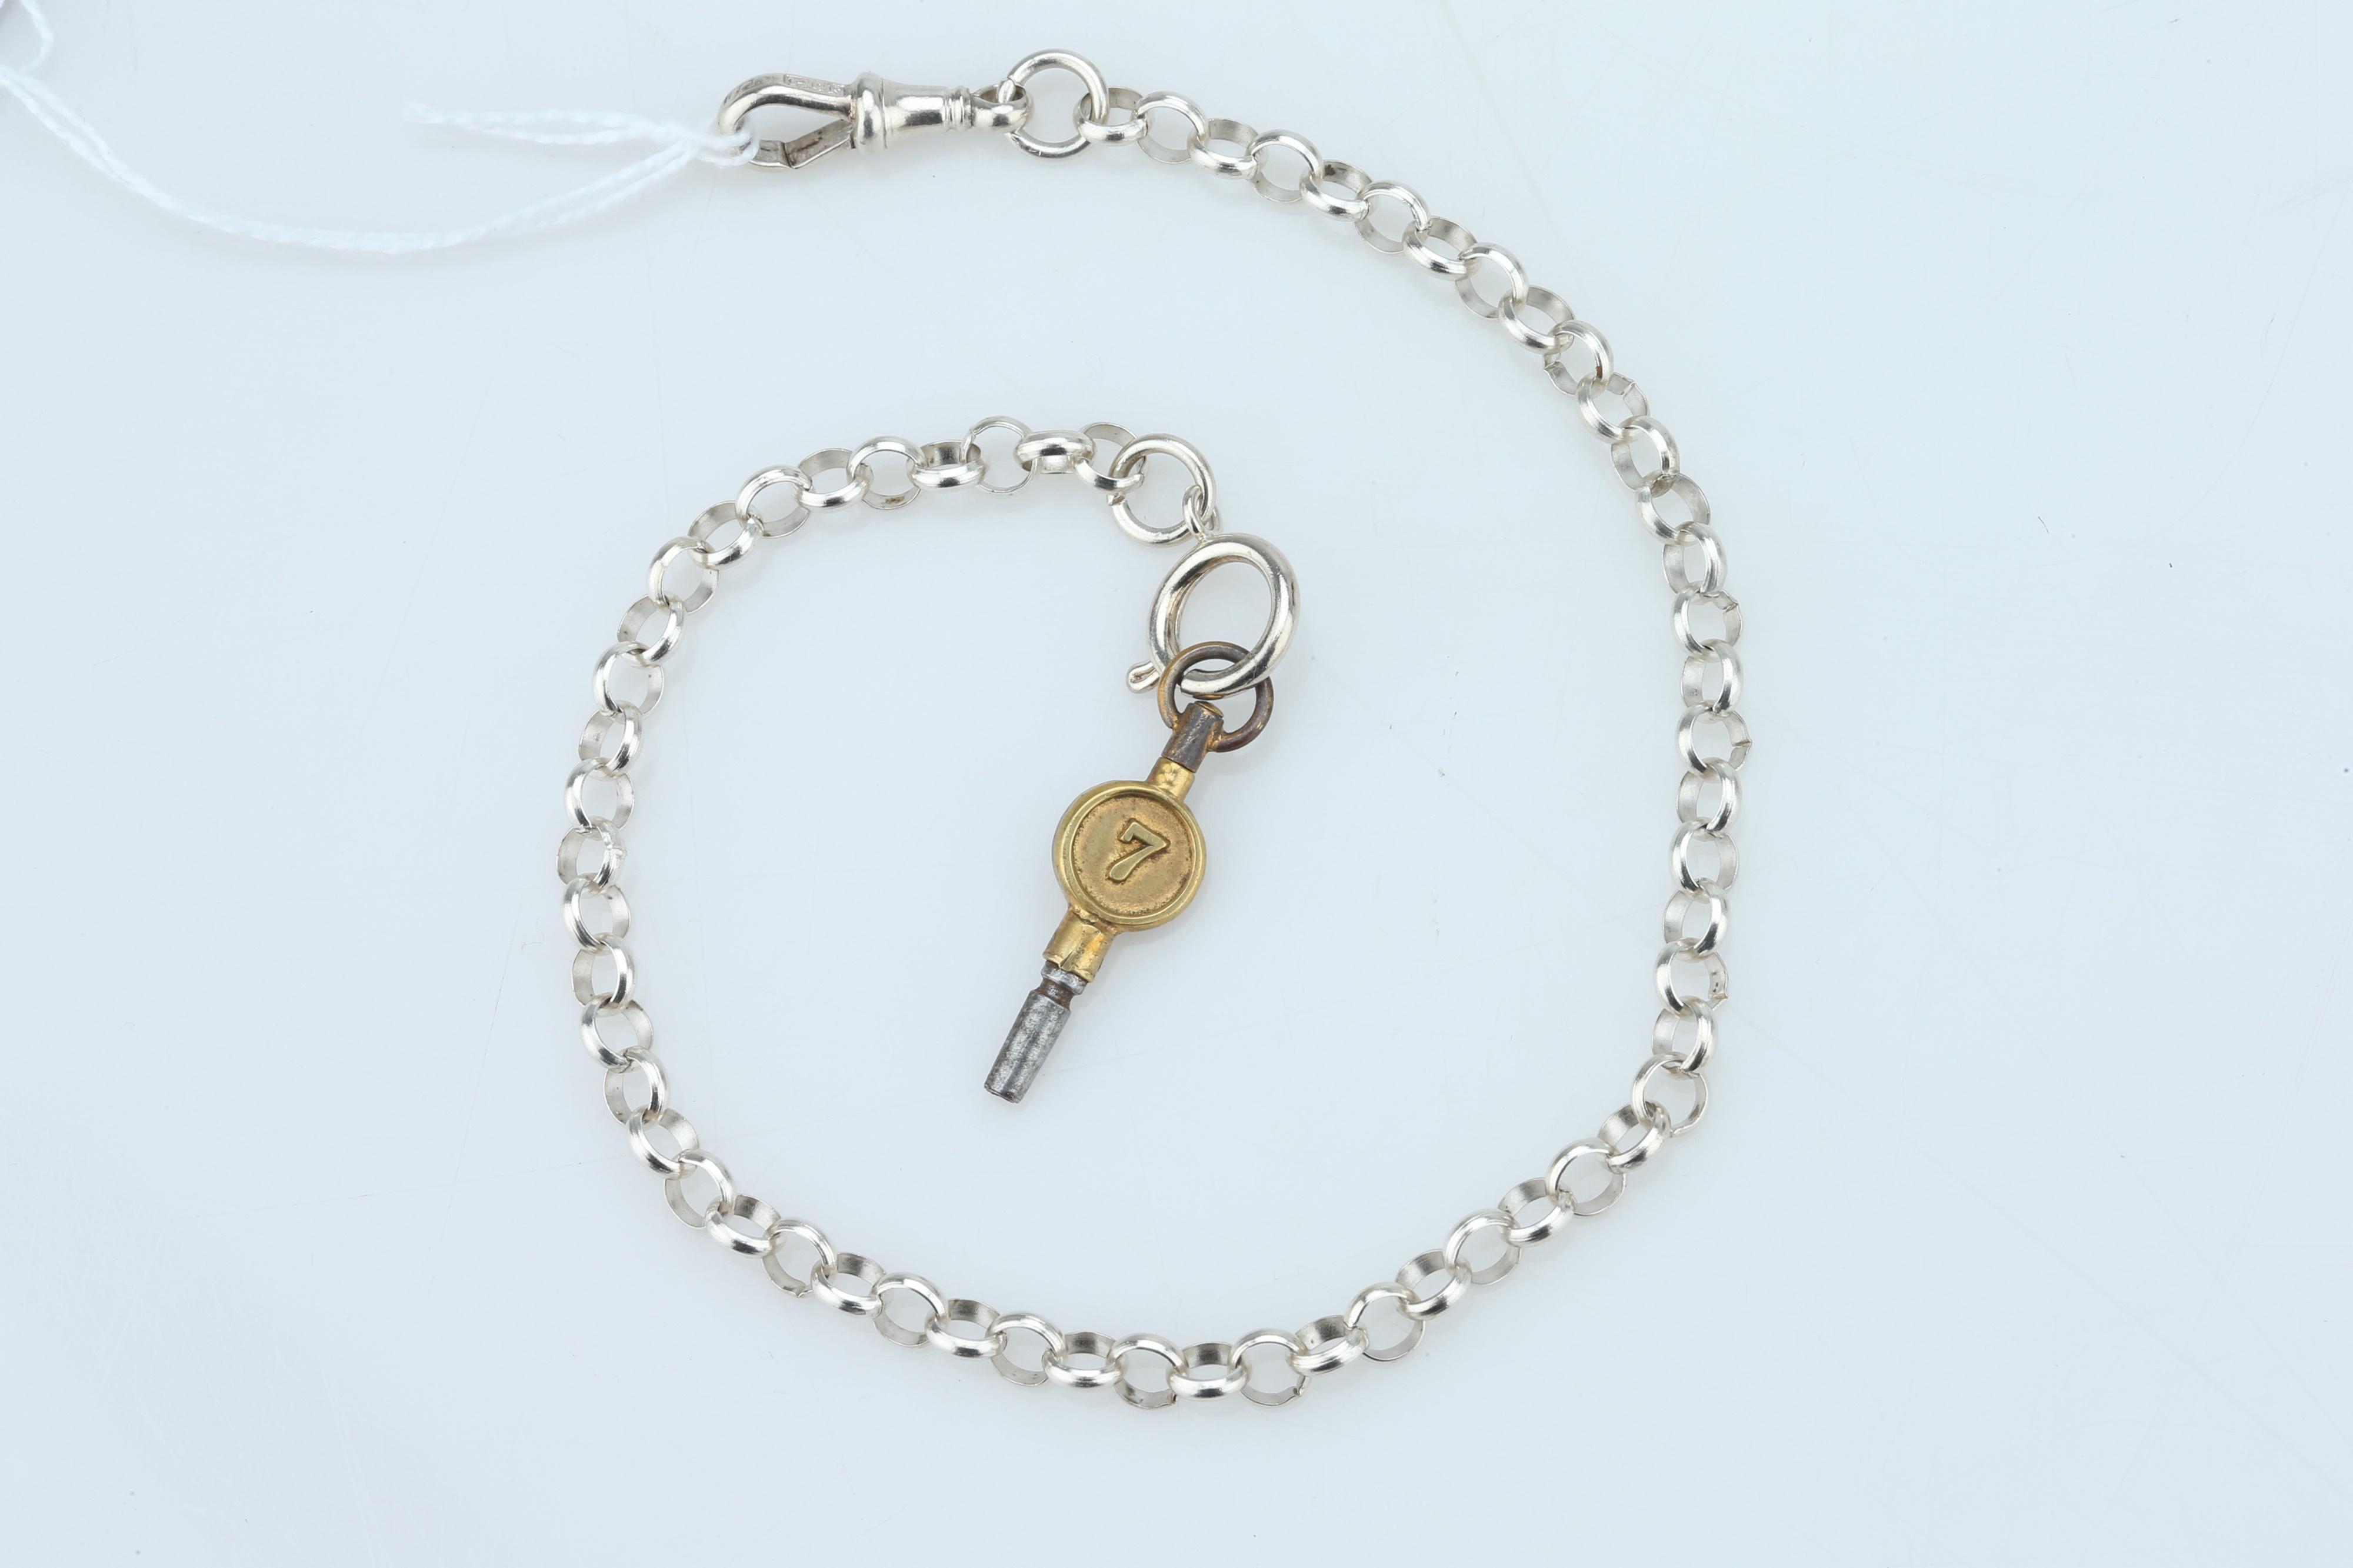 A Pocket Watch Chain